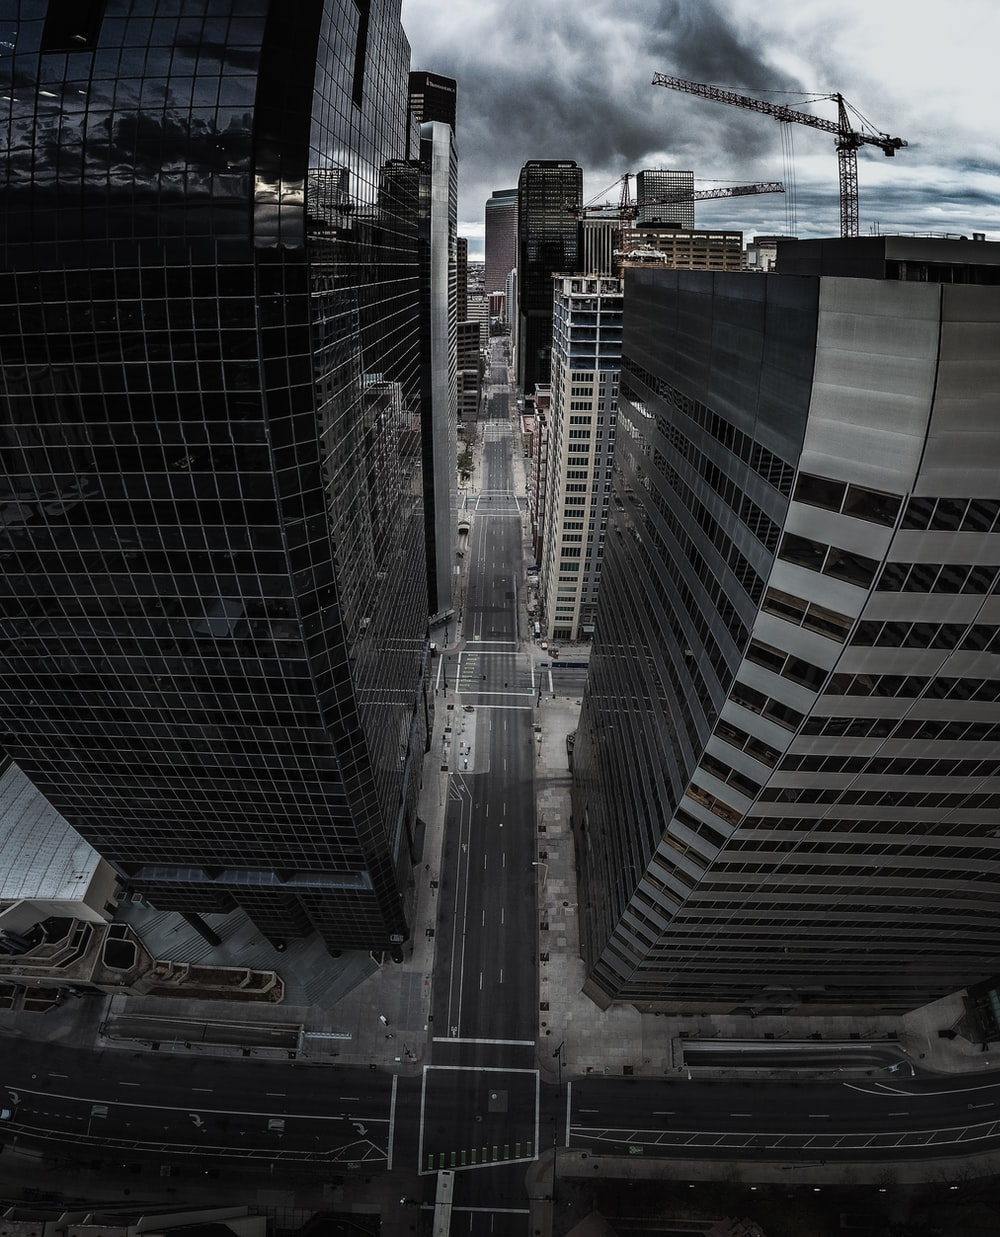 birds eye view photo of buildings